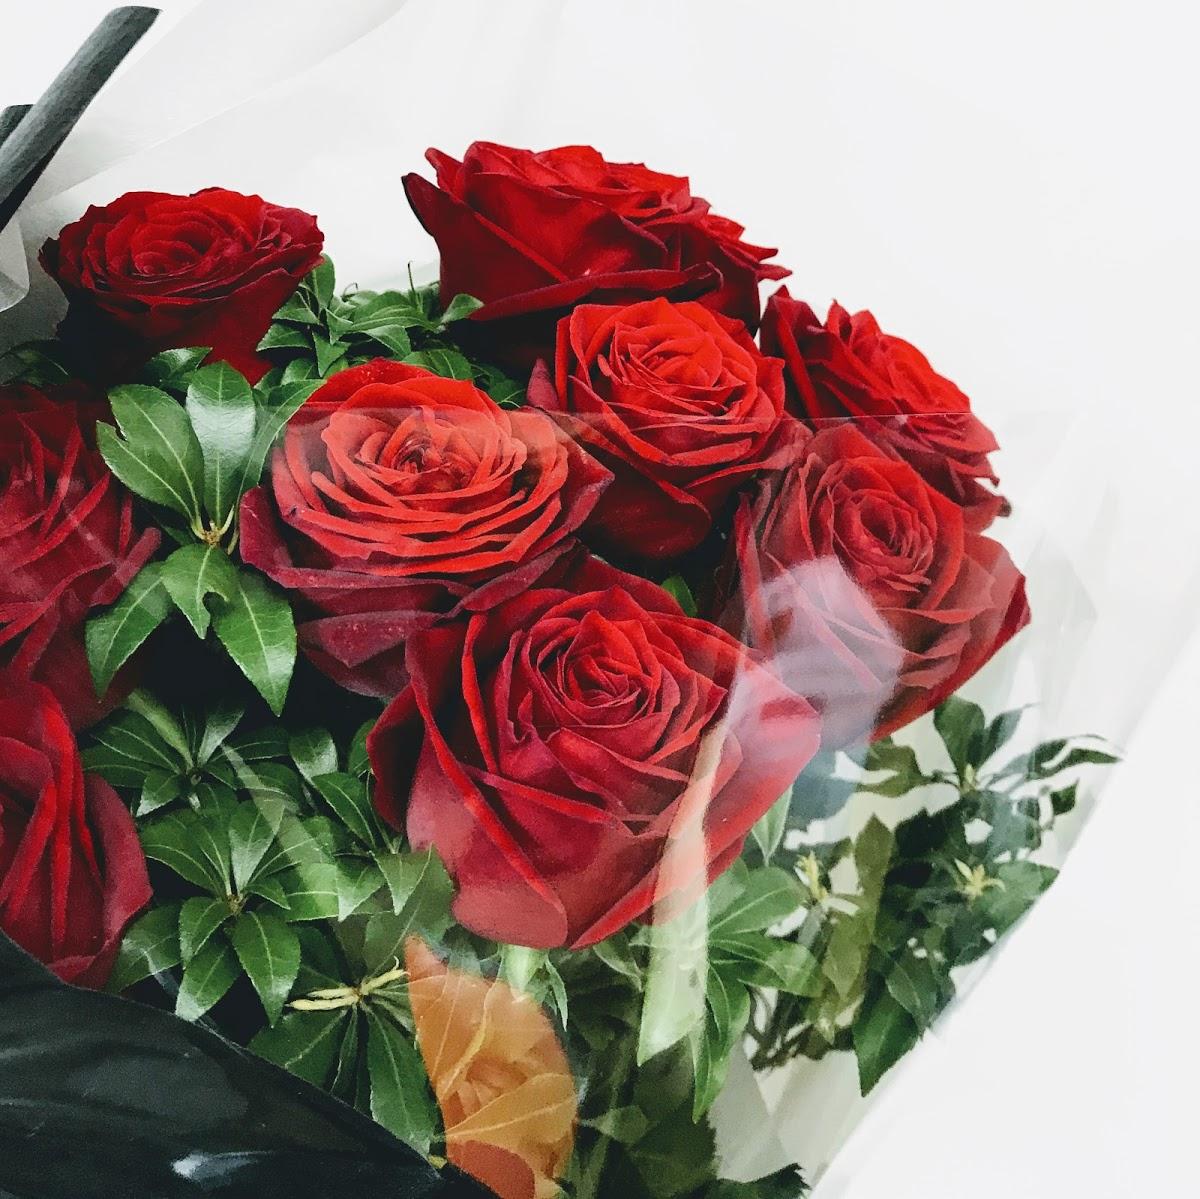 f:id:asunaro-flower:20200615022204j:plain